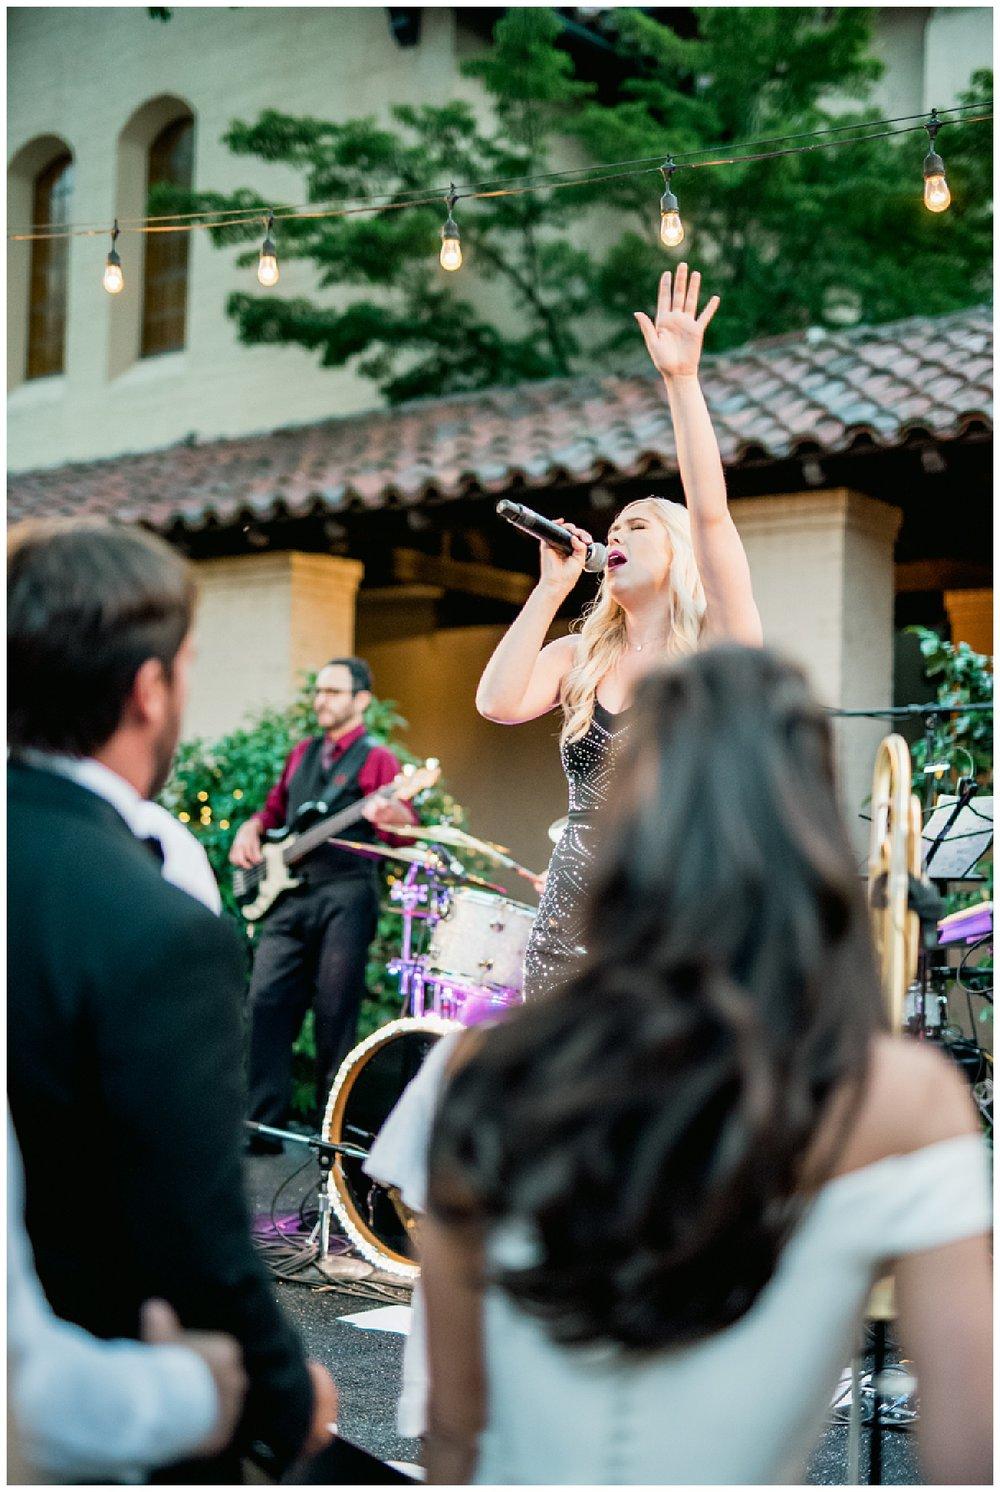 Janine_Licare_Photography_San_Francisco_Wedding_Photographer_0169.jpg